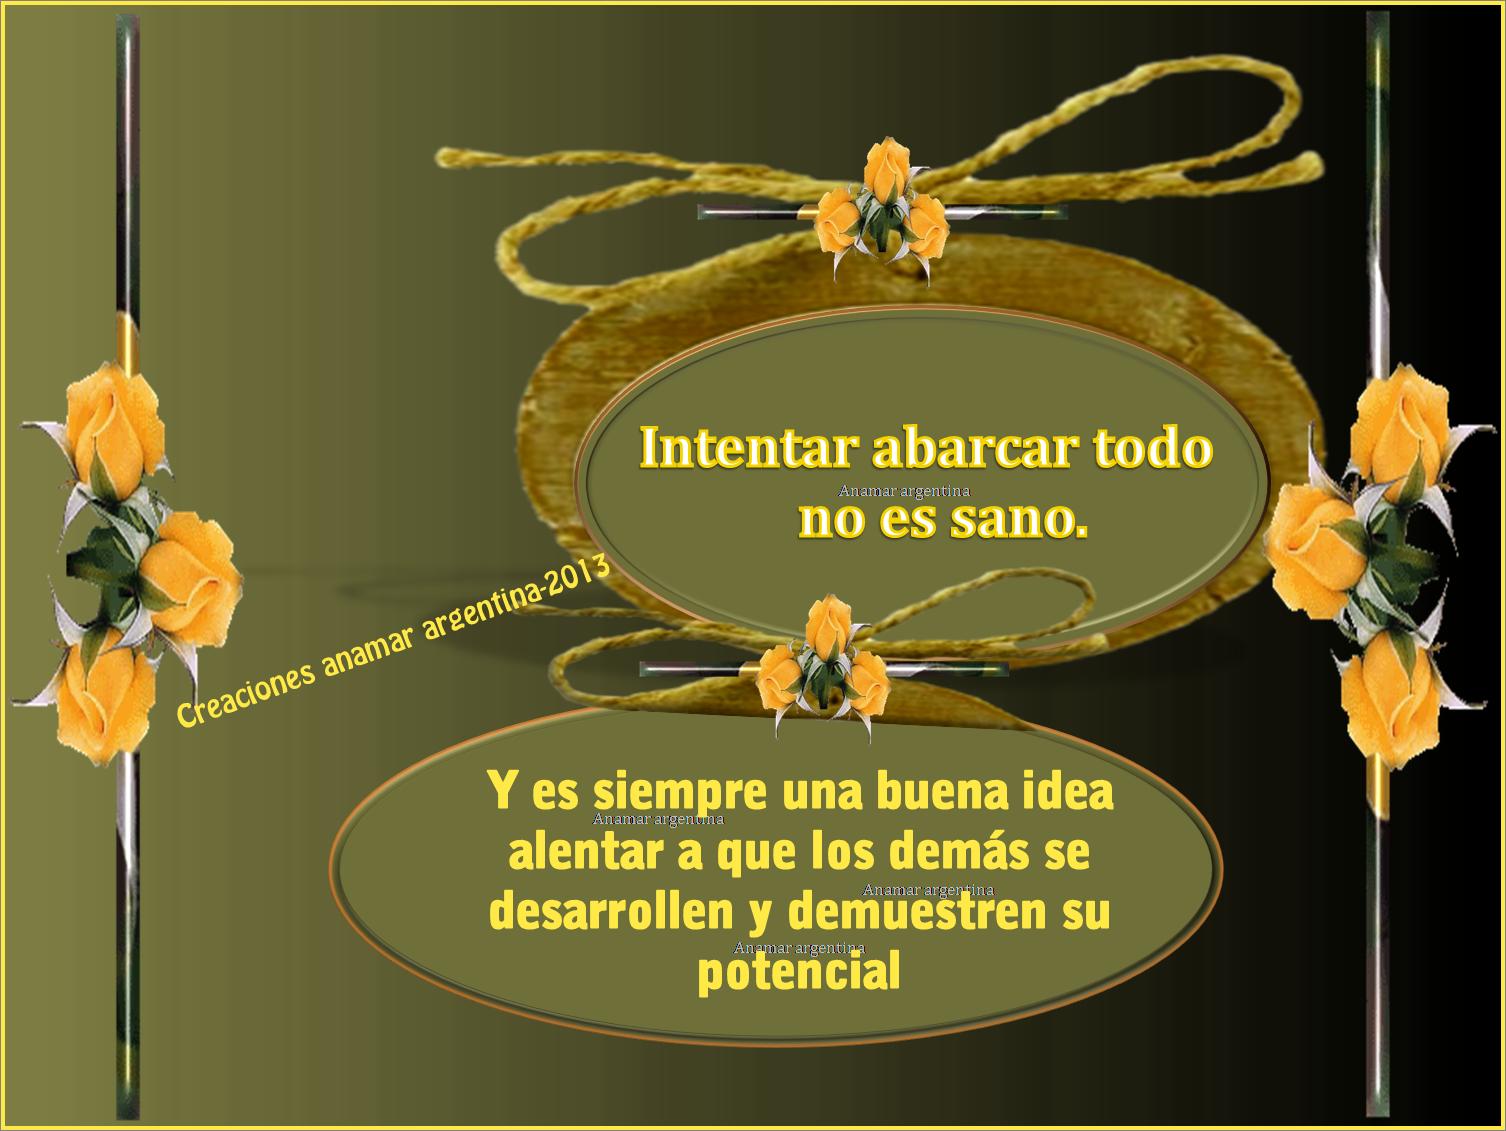 Imagenes Frases Pensamientos Positivos Motivadores Anamar Argentina